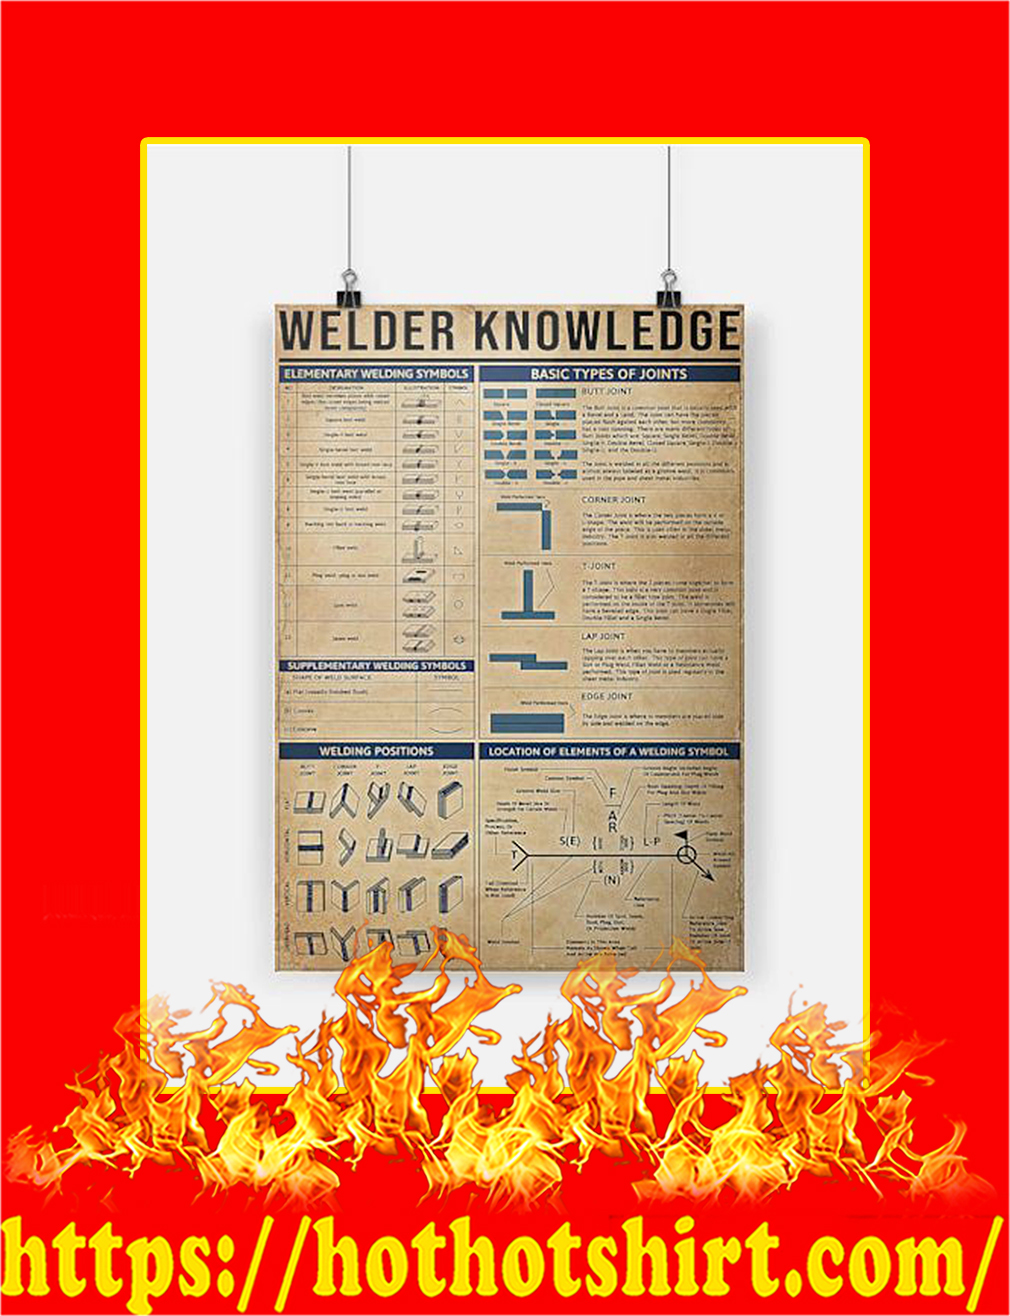 Welder Knowledge Poster - A4